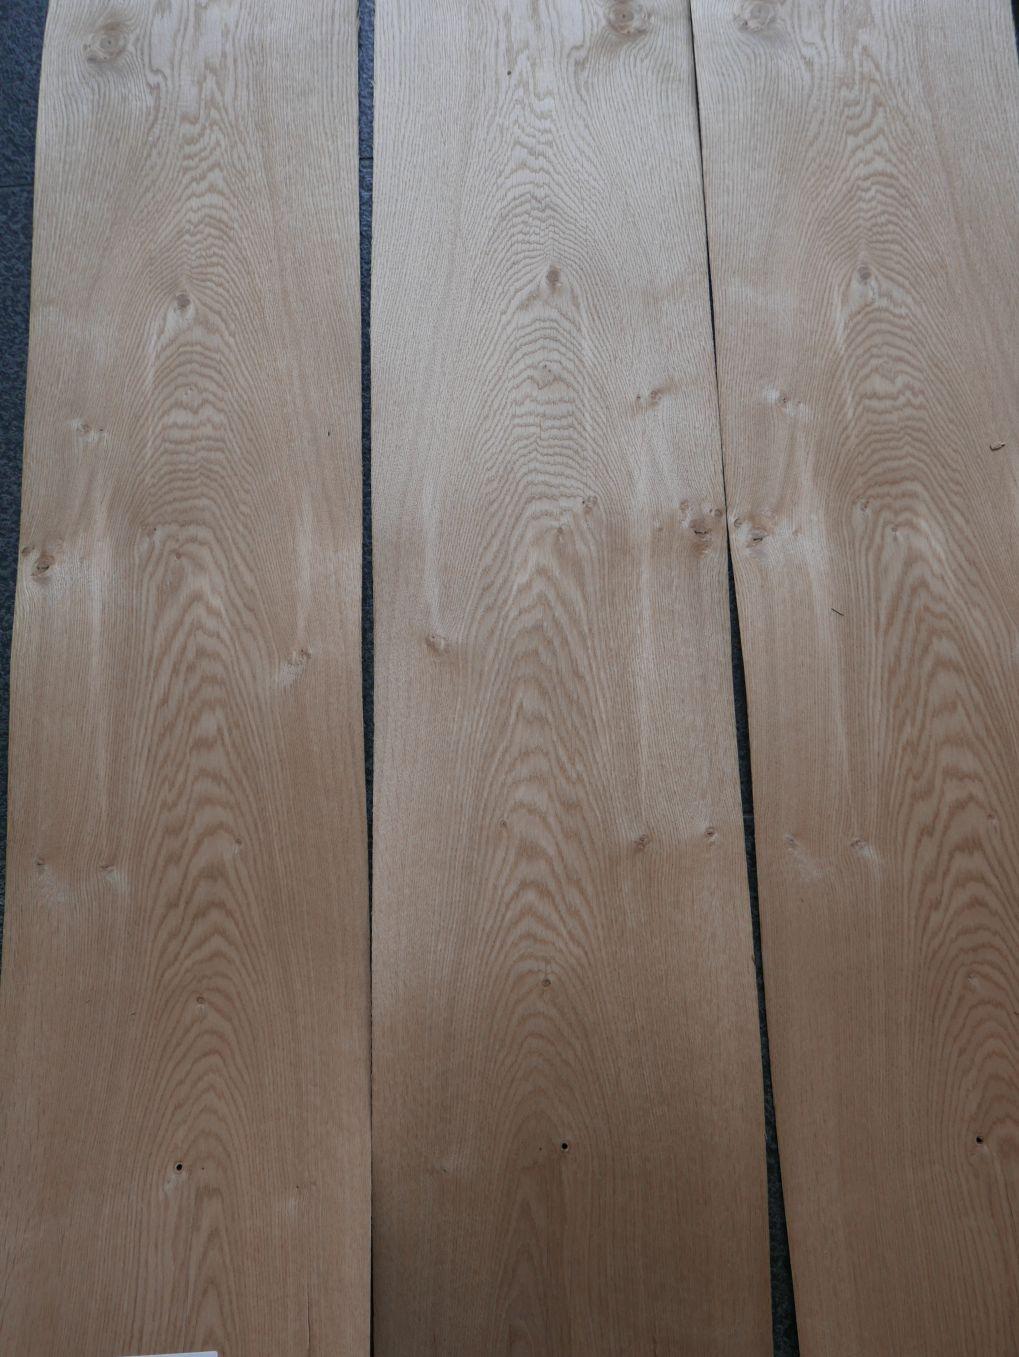 A555-7 Balken Eiken 29x258cm 16st